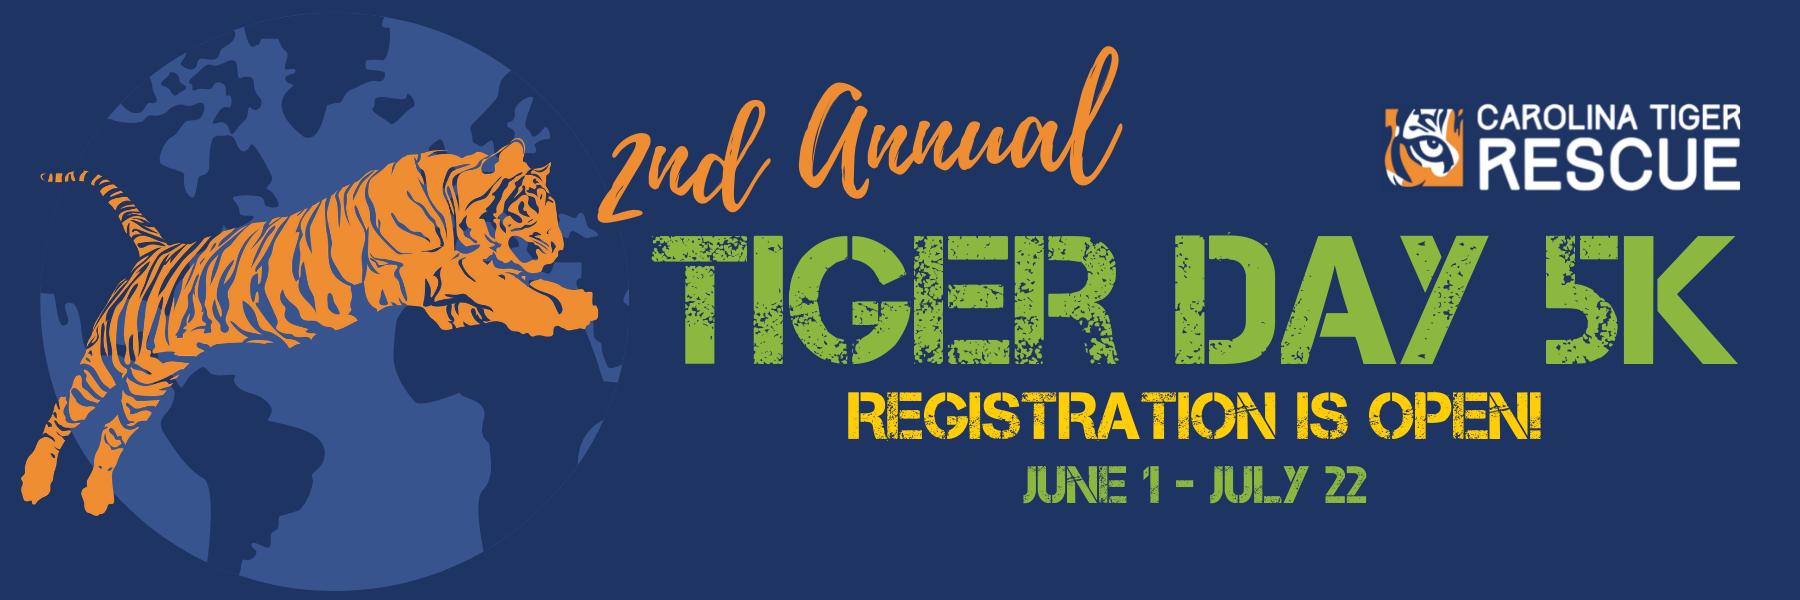 Carolina Tiger Rescue to host second virtual Tiger Day 5k in celebration of International Tiger Day on July 29